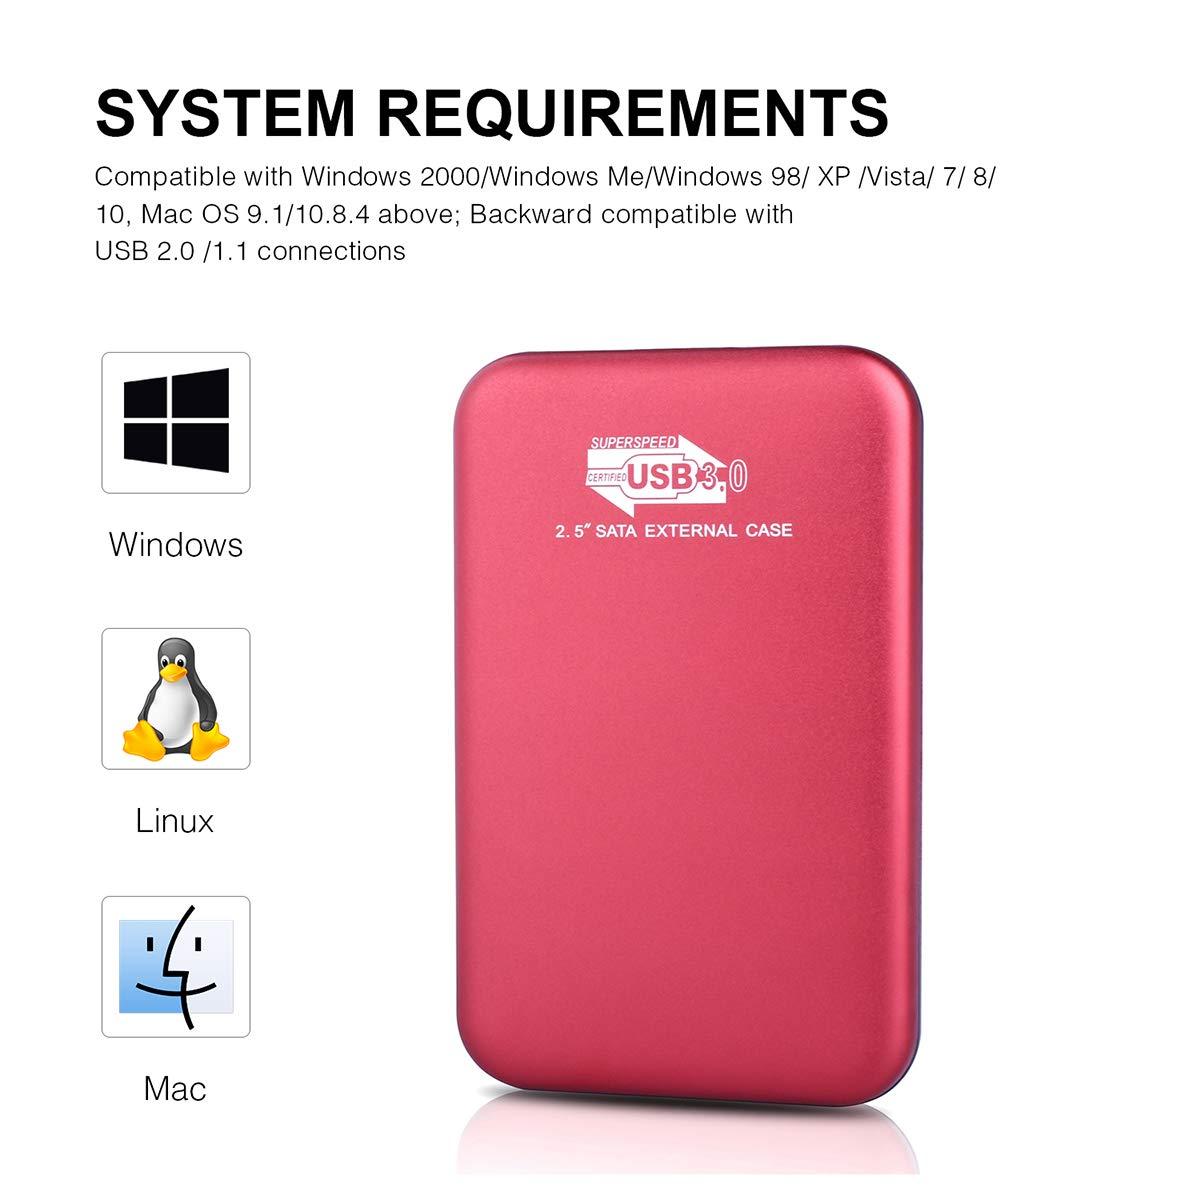 External Hard Drive, Portable Hard Drive USB3.0 Hard Drive Compatible Mac, PC, Desktop, Laptop, MacBook, Chromebook, Xbox One, Xbox 360, PS4 (1TB, Black) by Amtete (Image #4)